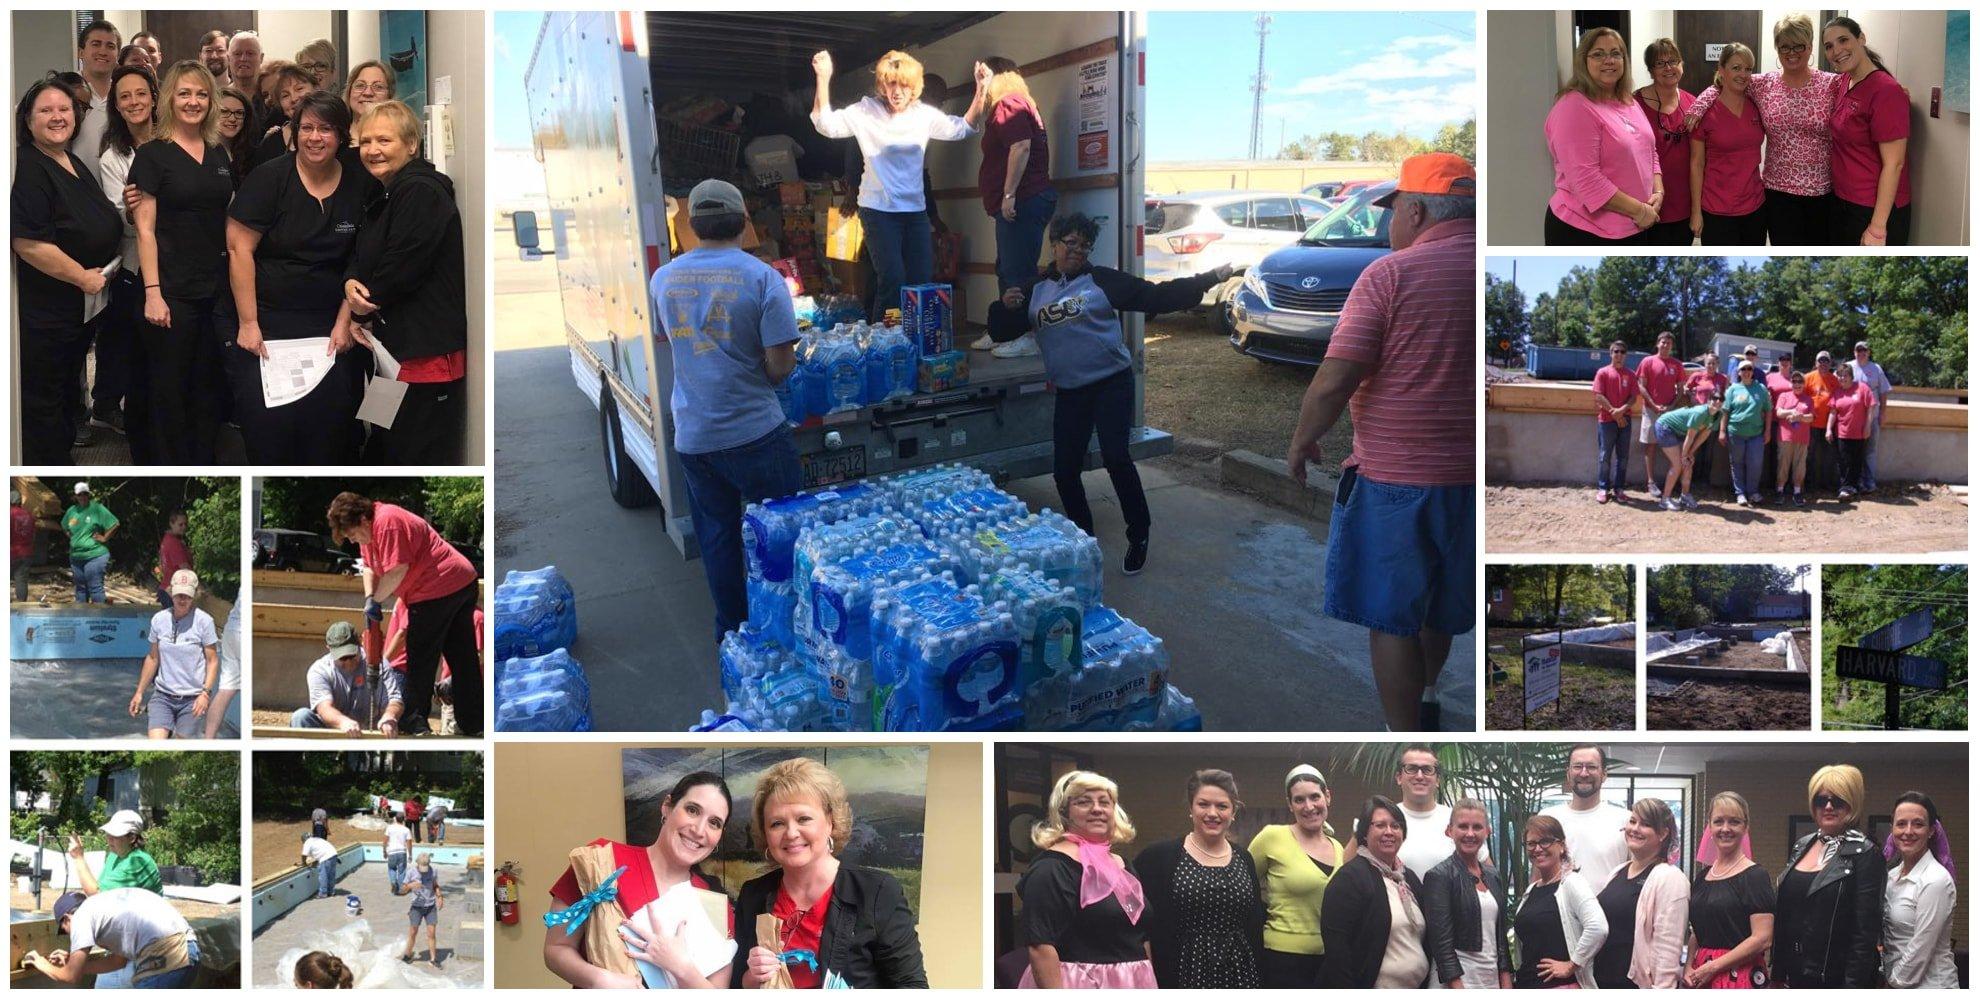 Collage of Croasdaile Dental Arts team volunteering around the community